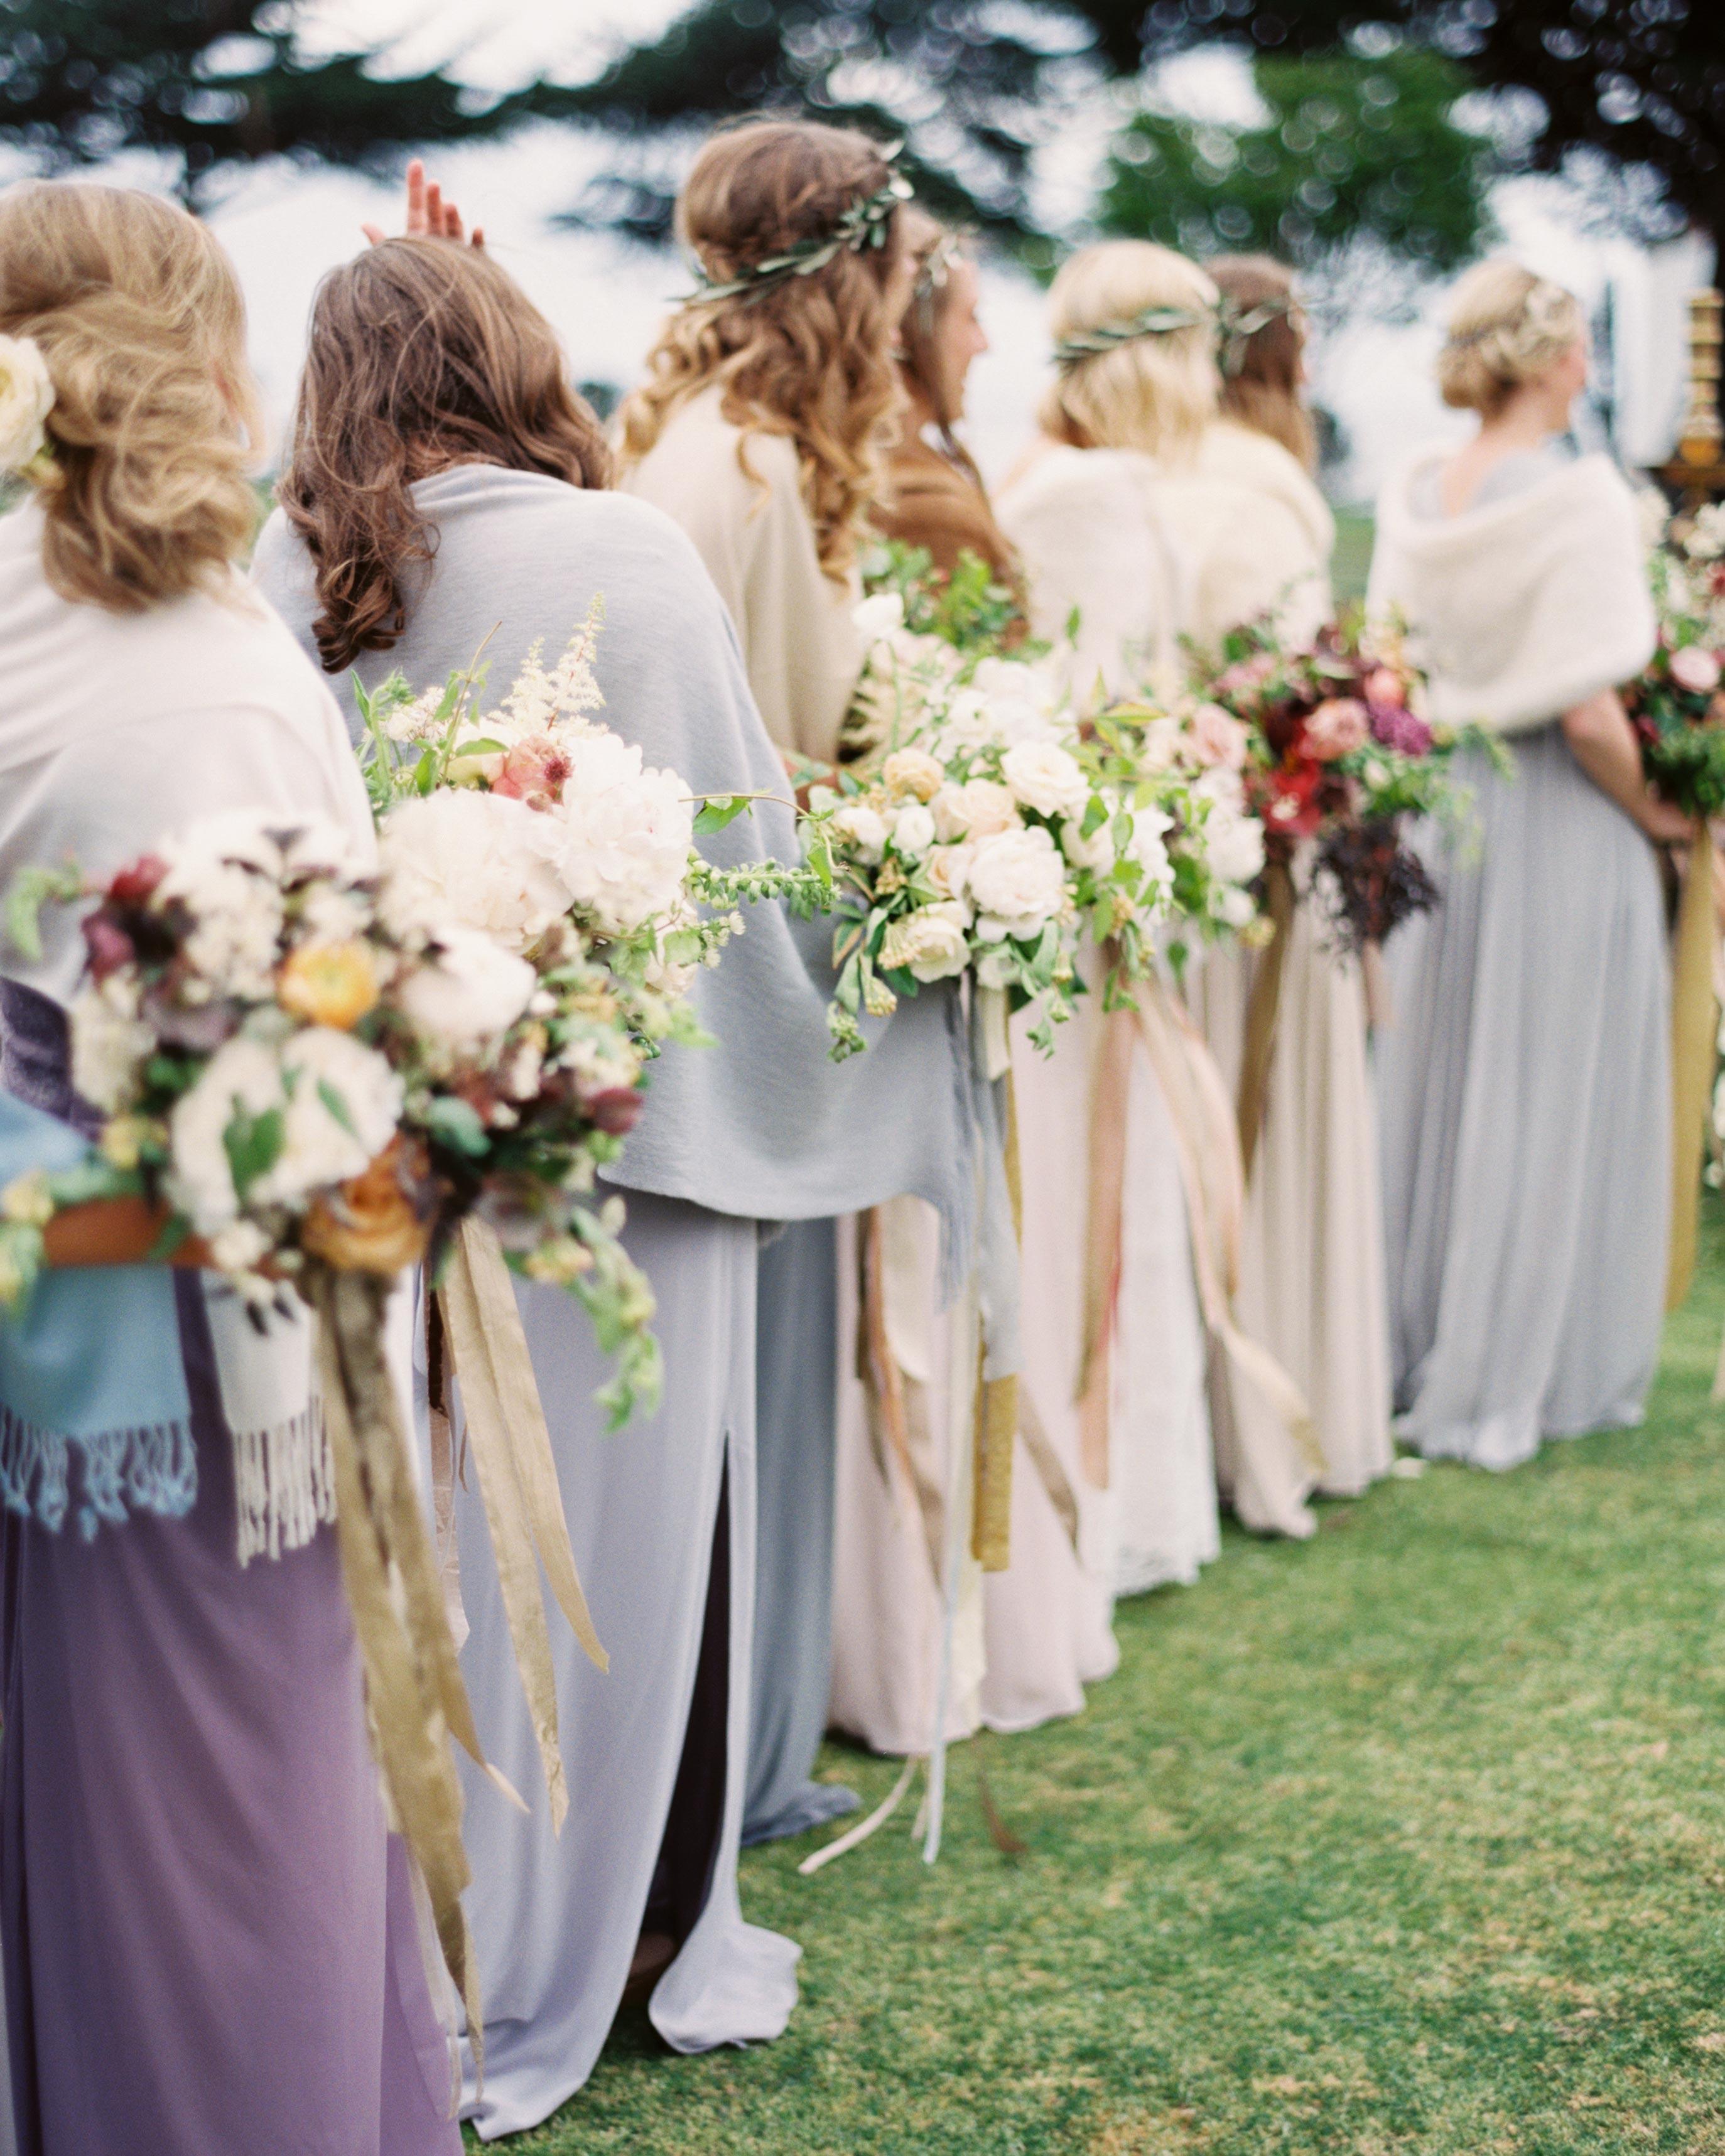 ginny-andrew-wedding-bridesmaids-0572-s112676-0216.jpg